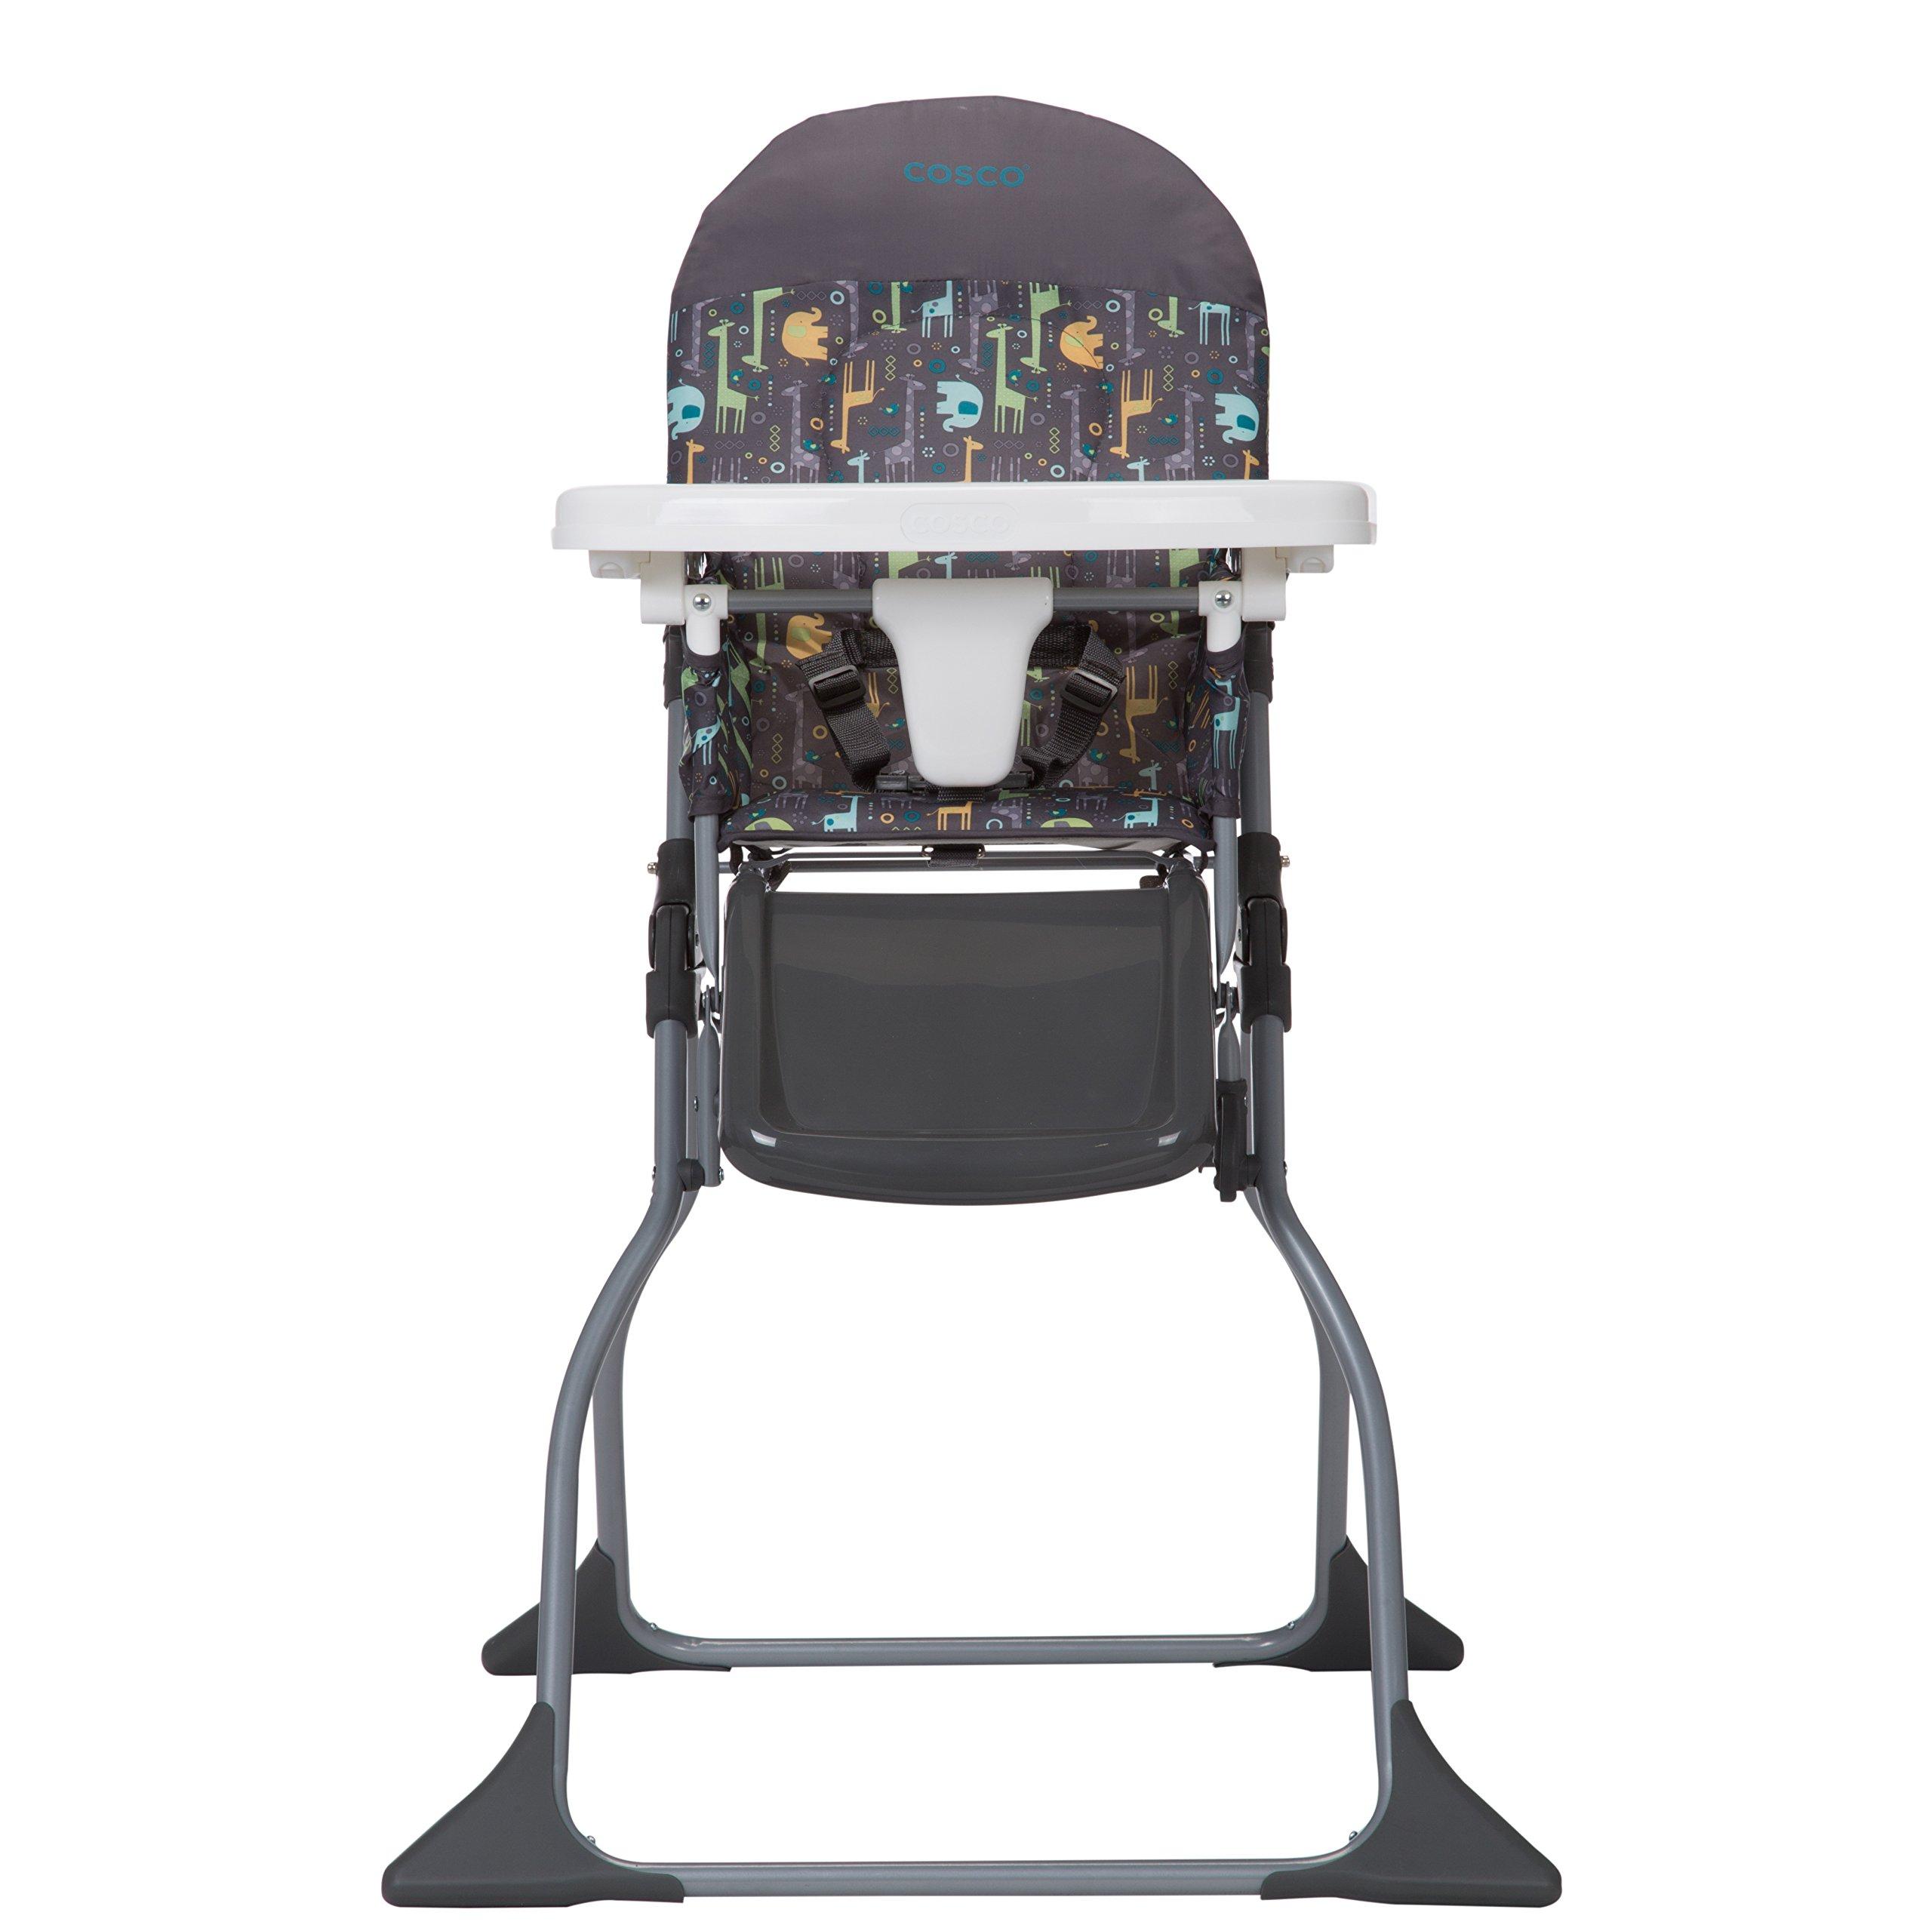 Admirable Cheap Fold Pp Chair Find Fold Pp Chair Deals On Line At Machost Co Dining Chair Design Ideas Machostcouk